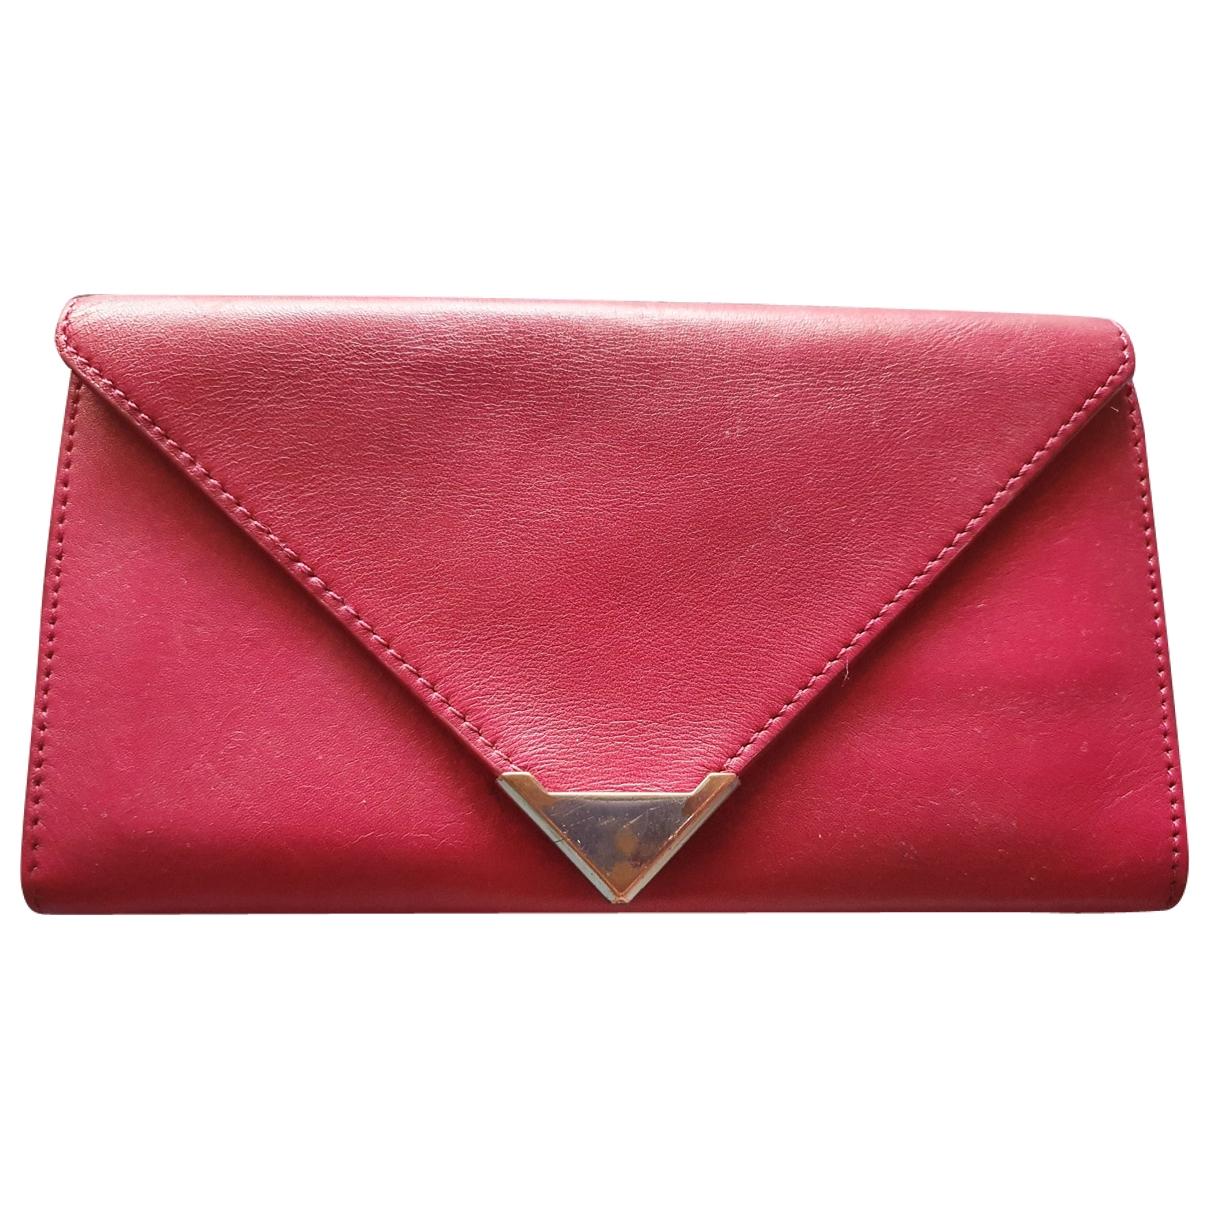 Alexander Wang - Portefeuille   pour femme en cuir - rose